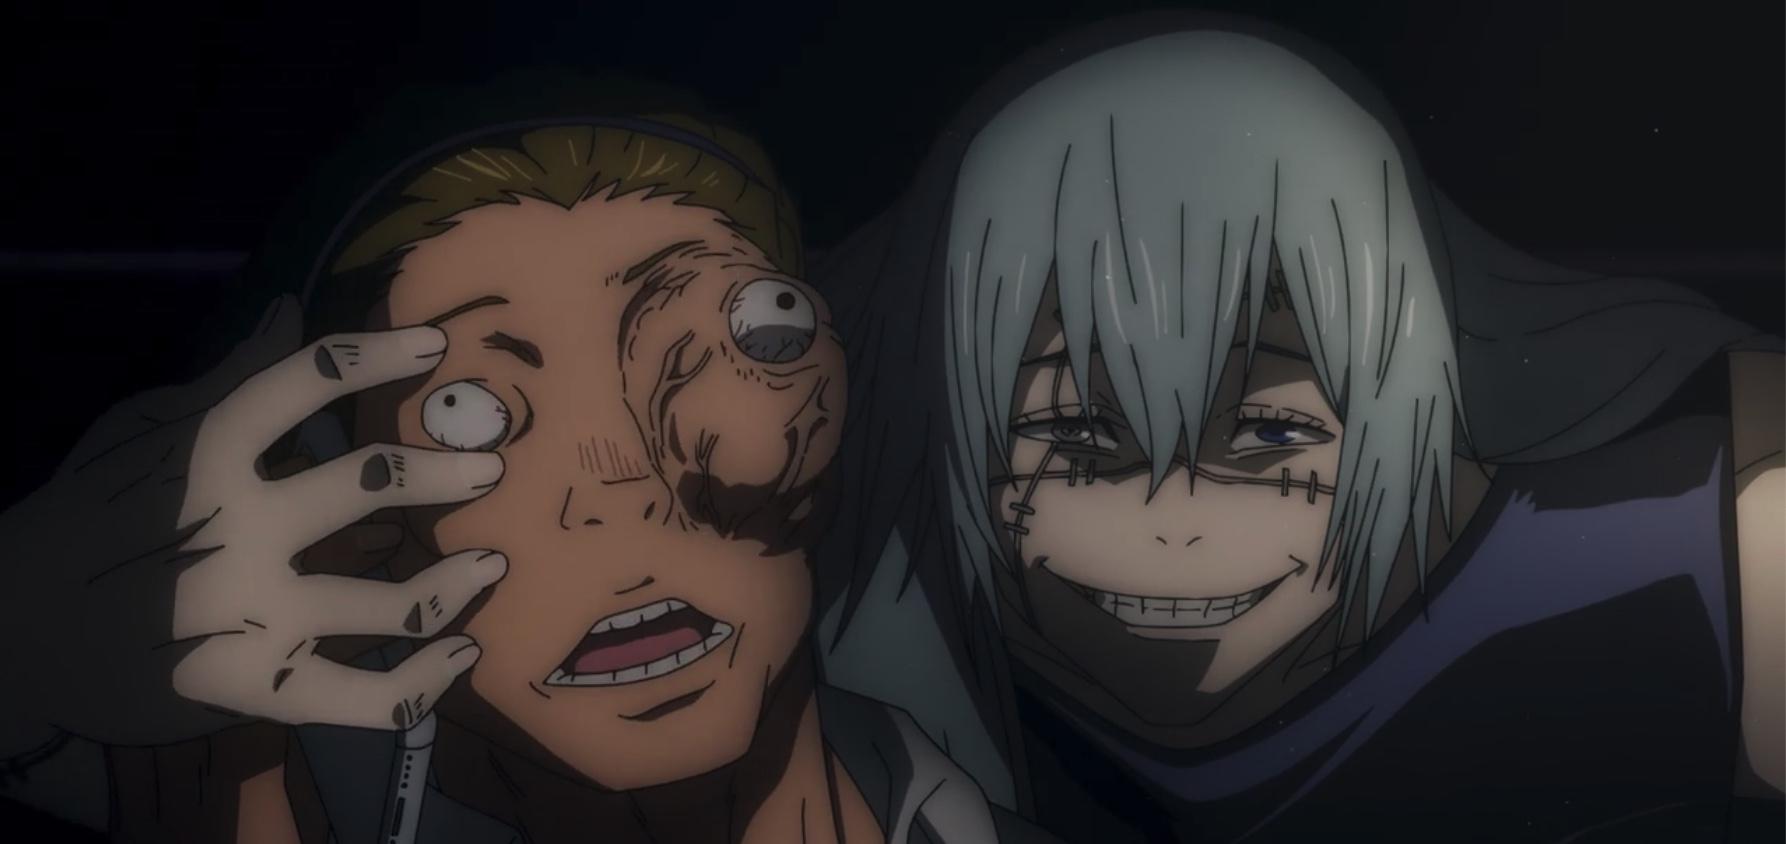 TVアニメ「呪術廻戦」第9話「幼魚と逆罰」 - にじめん